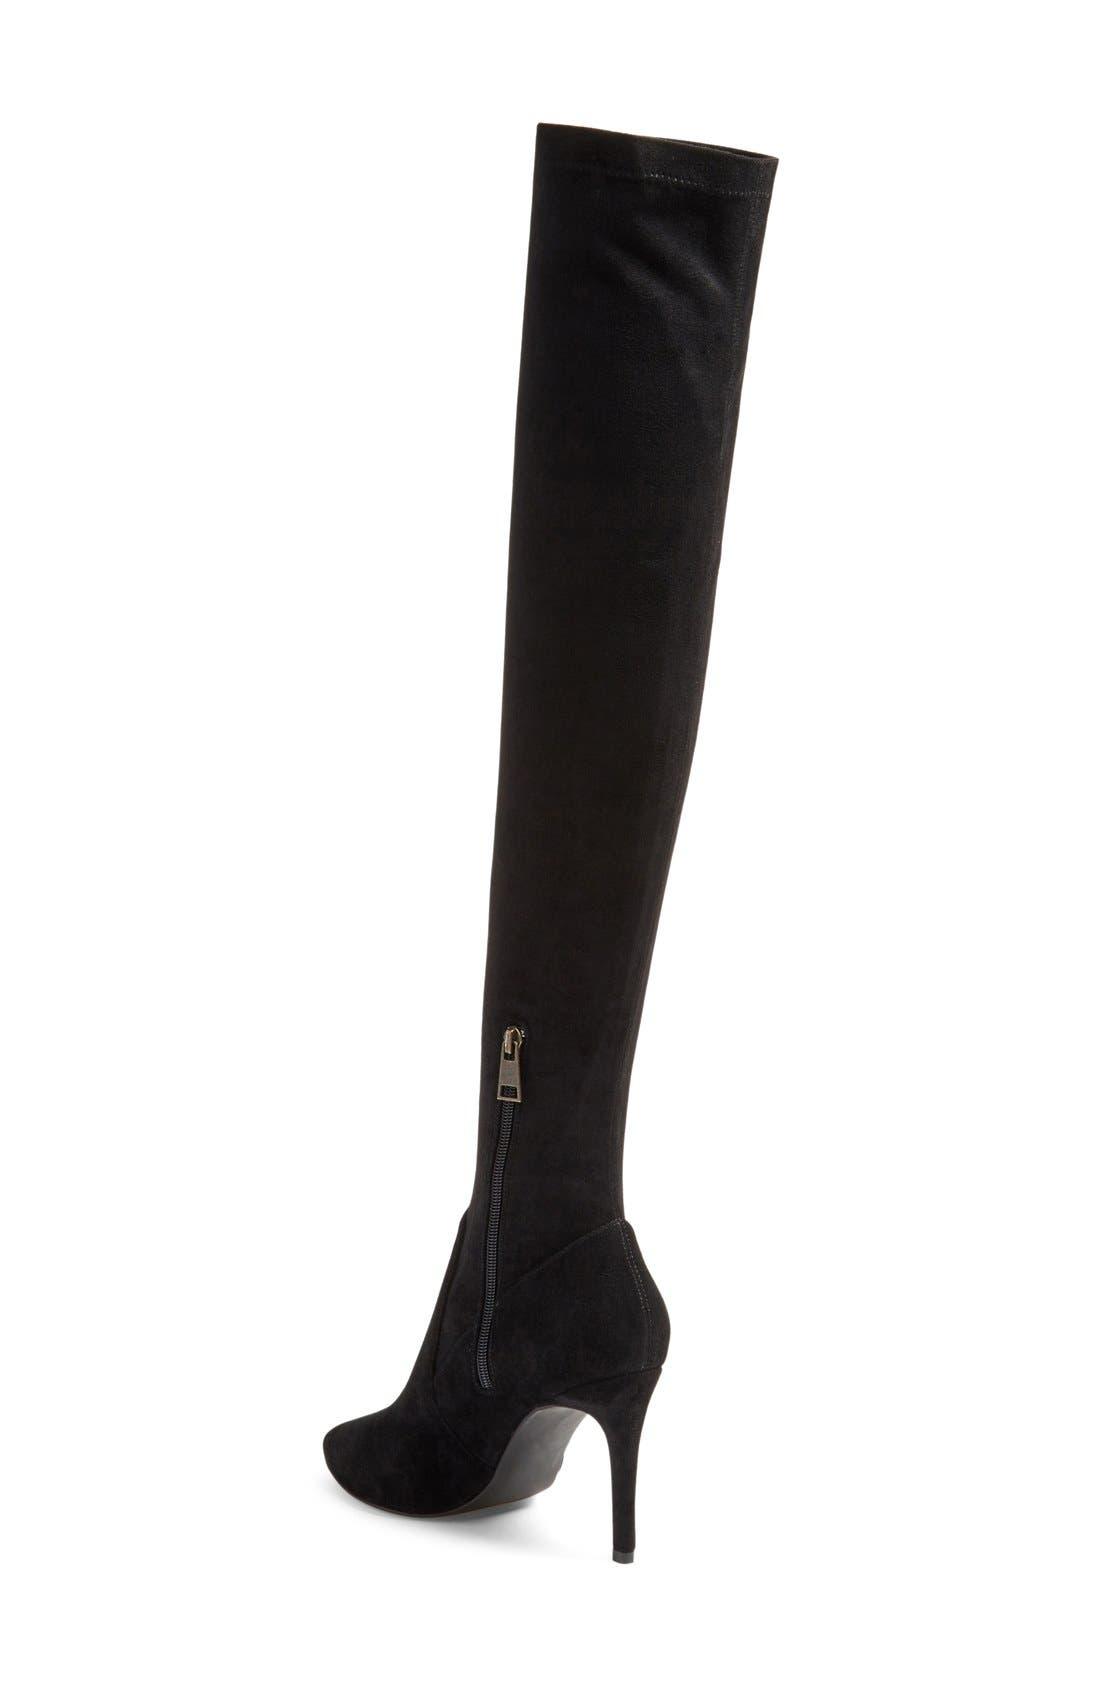 Alternate Image 2  - Joie 'Jemina' Over the Knee Boot (Women) (Narrow Calf)